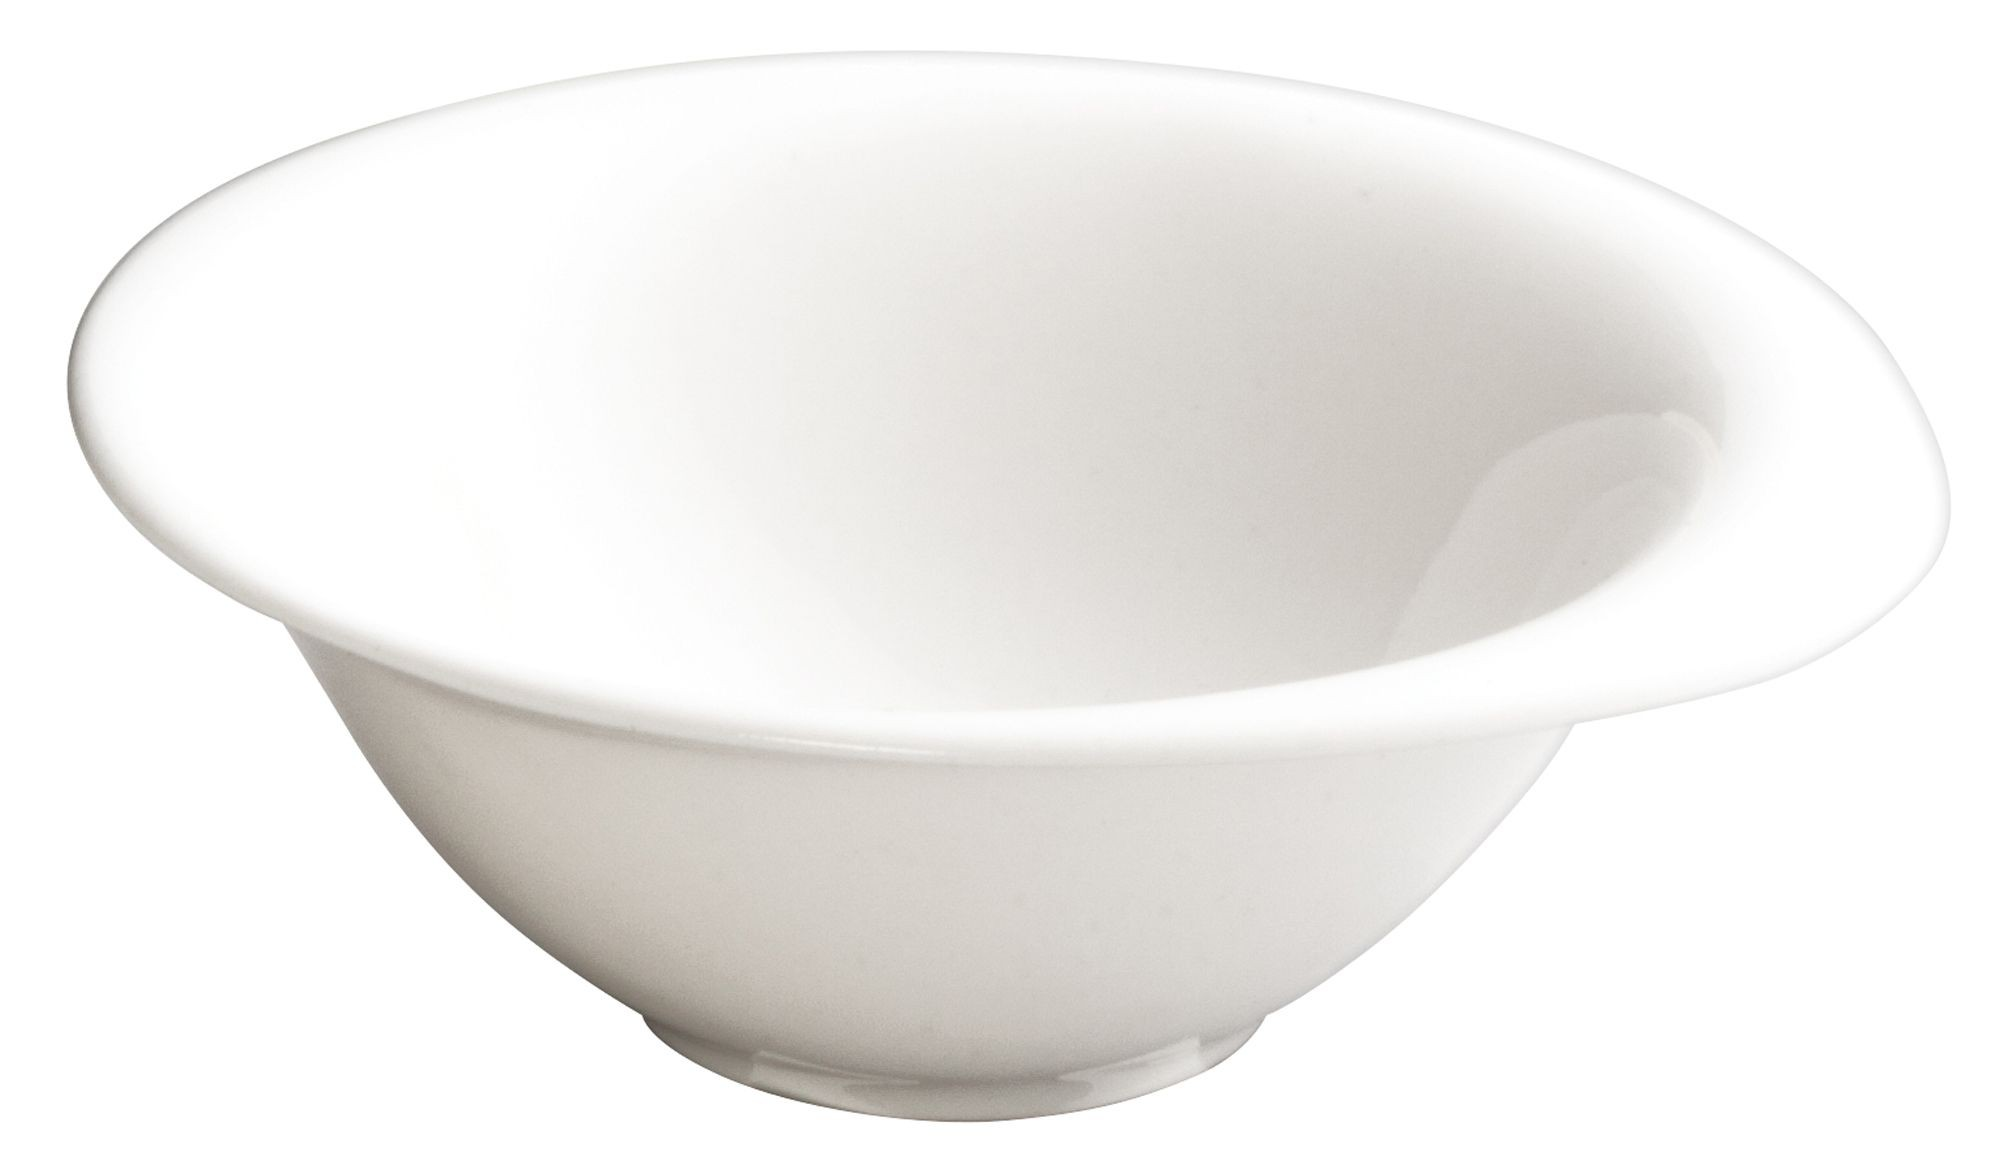 "Winco WDP004-206 Ocea Creamy White Porcelain Round Bowl 6"""